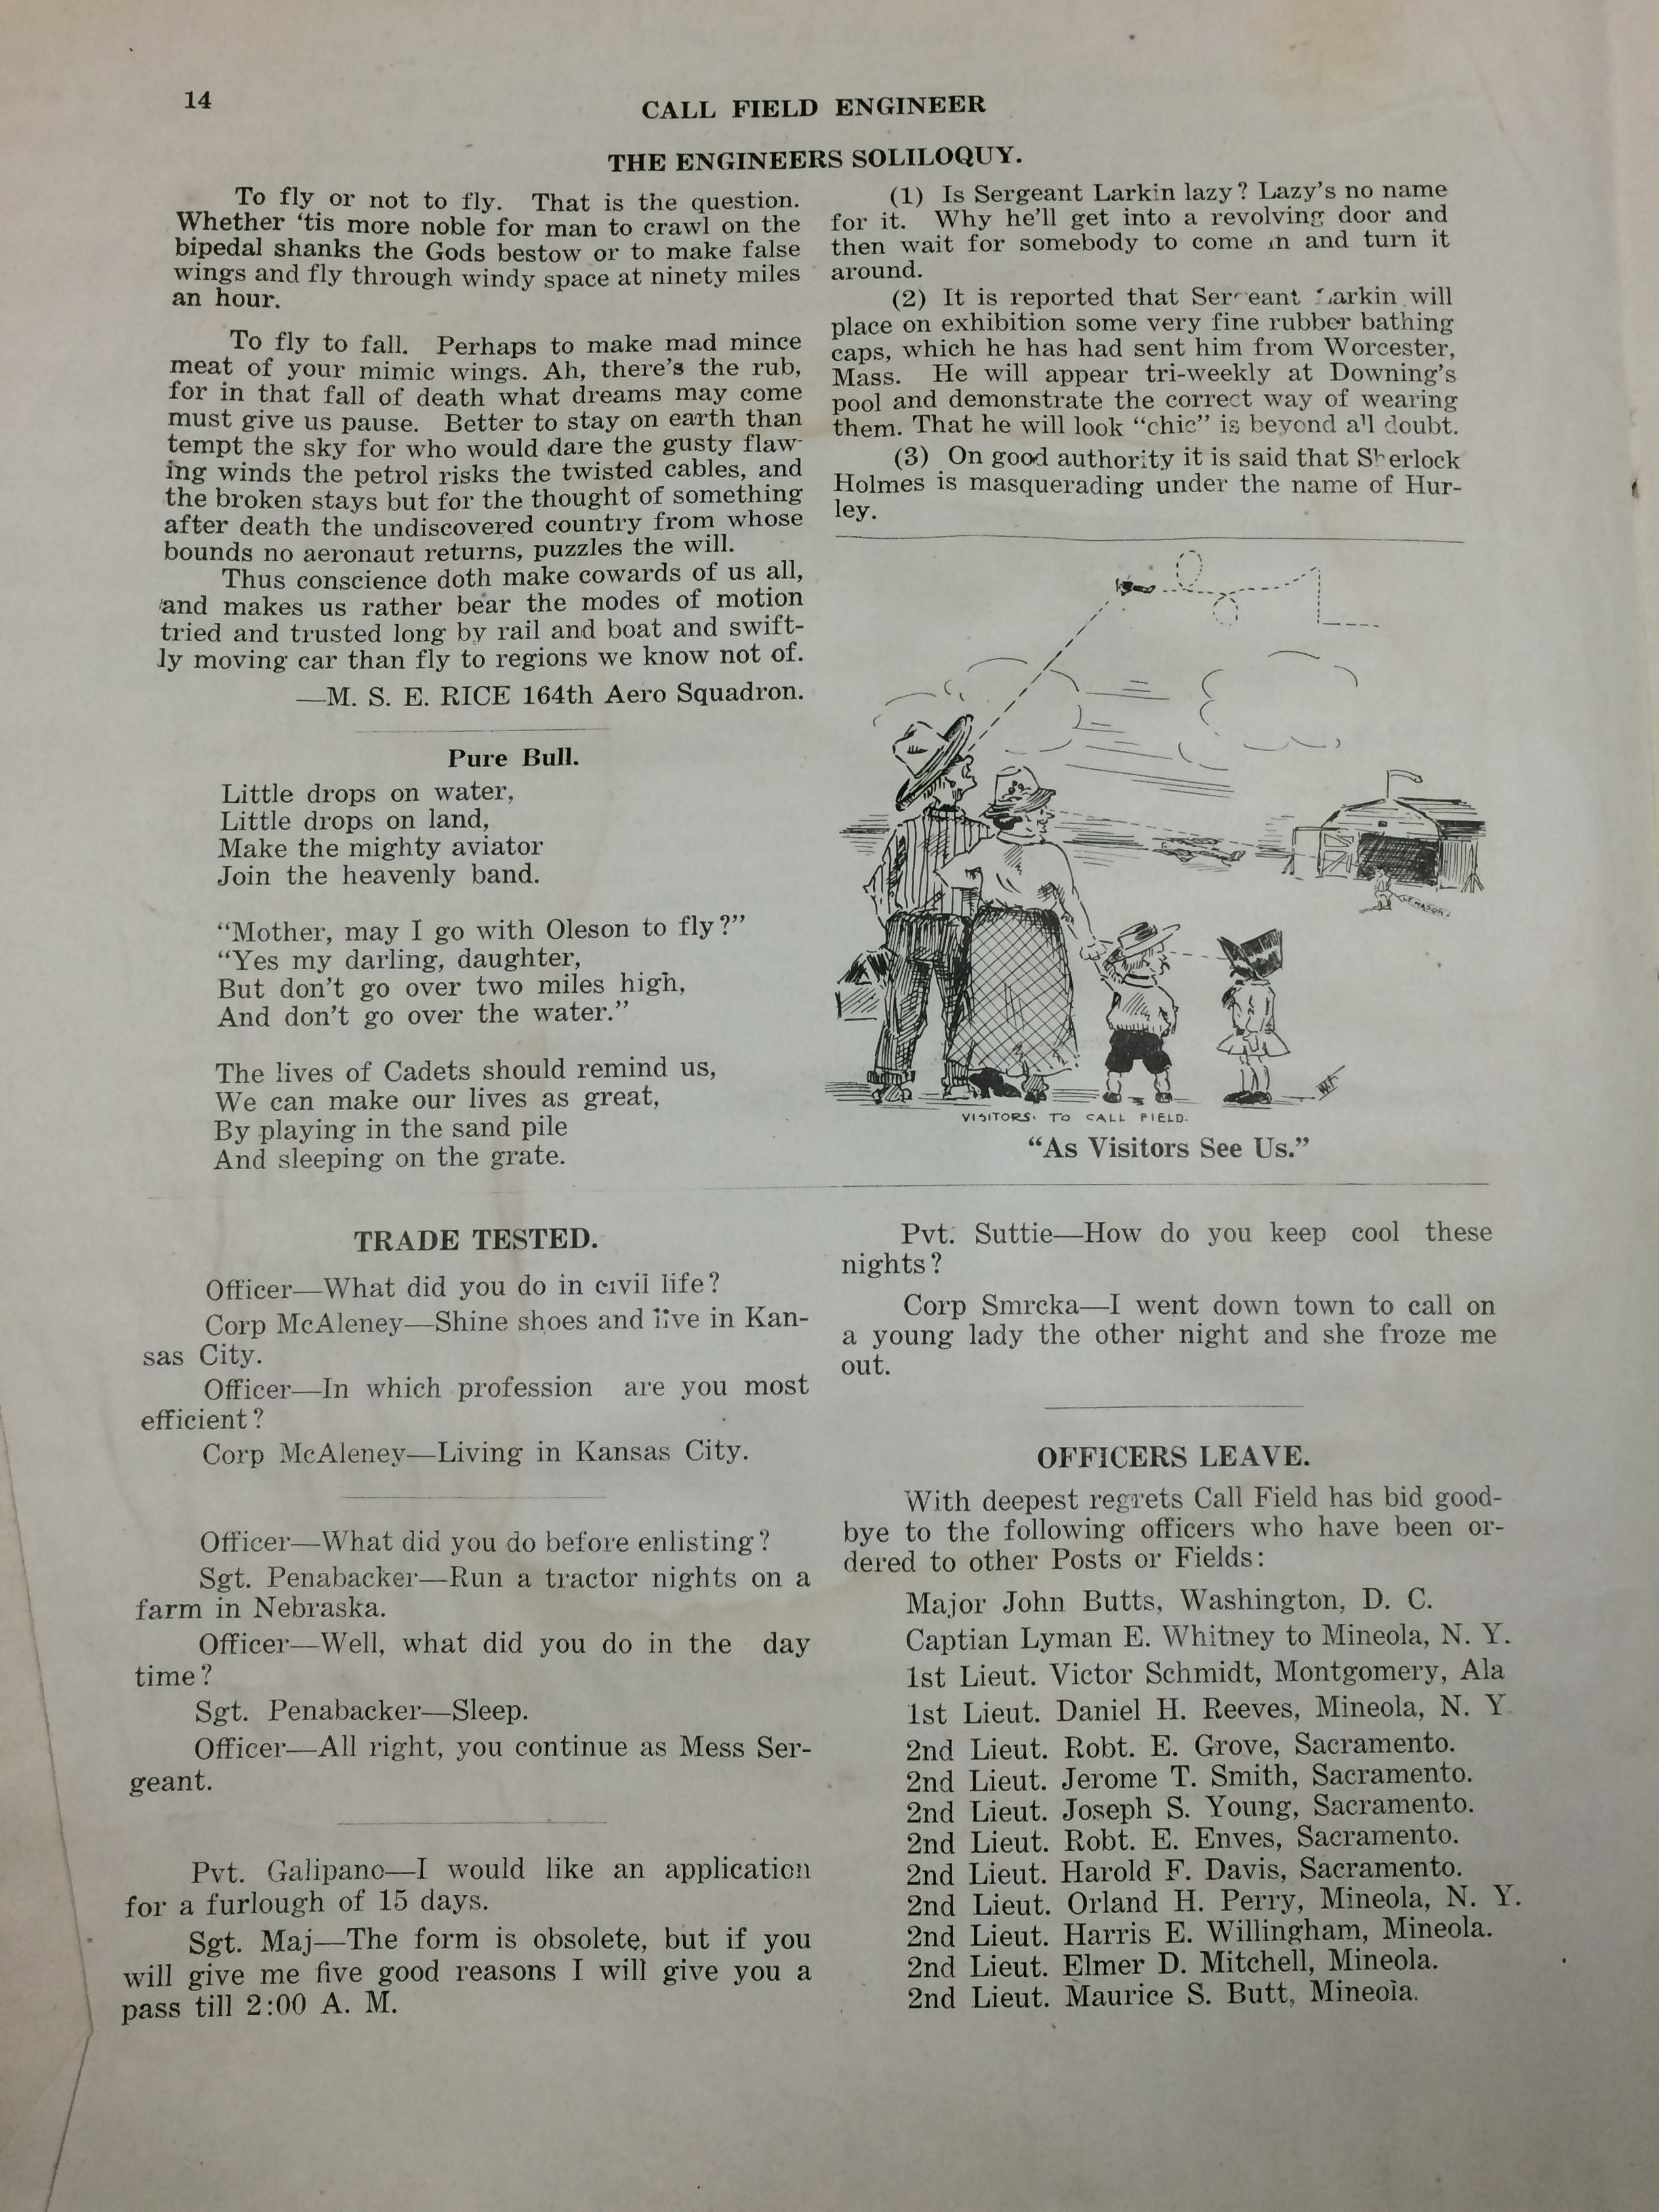 Image 16 July 1918 Engineer